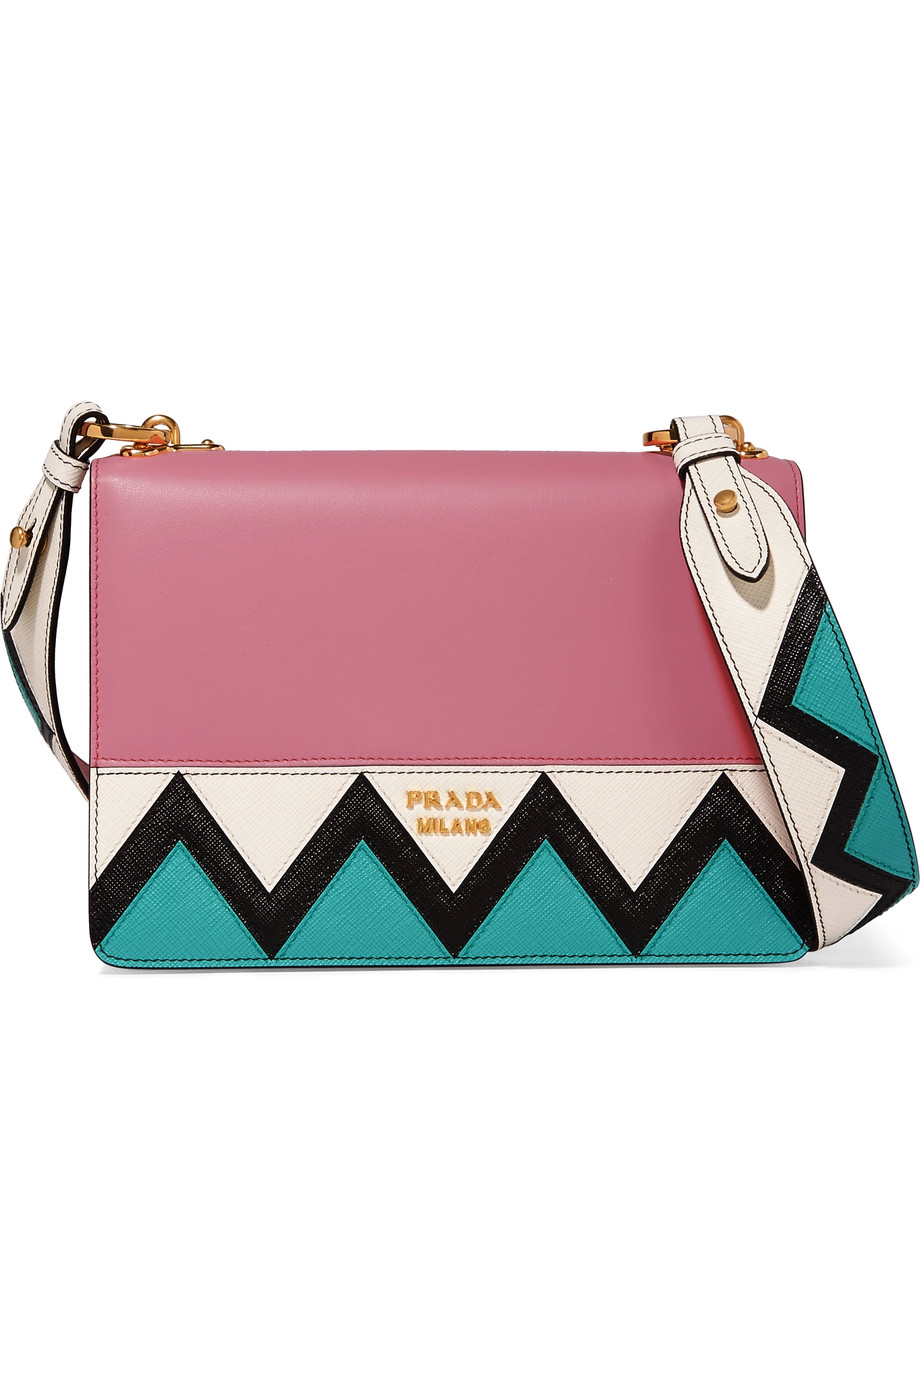 Prada  Zig Zag Shoulder Bag  ($2100)